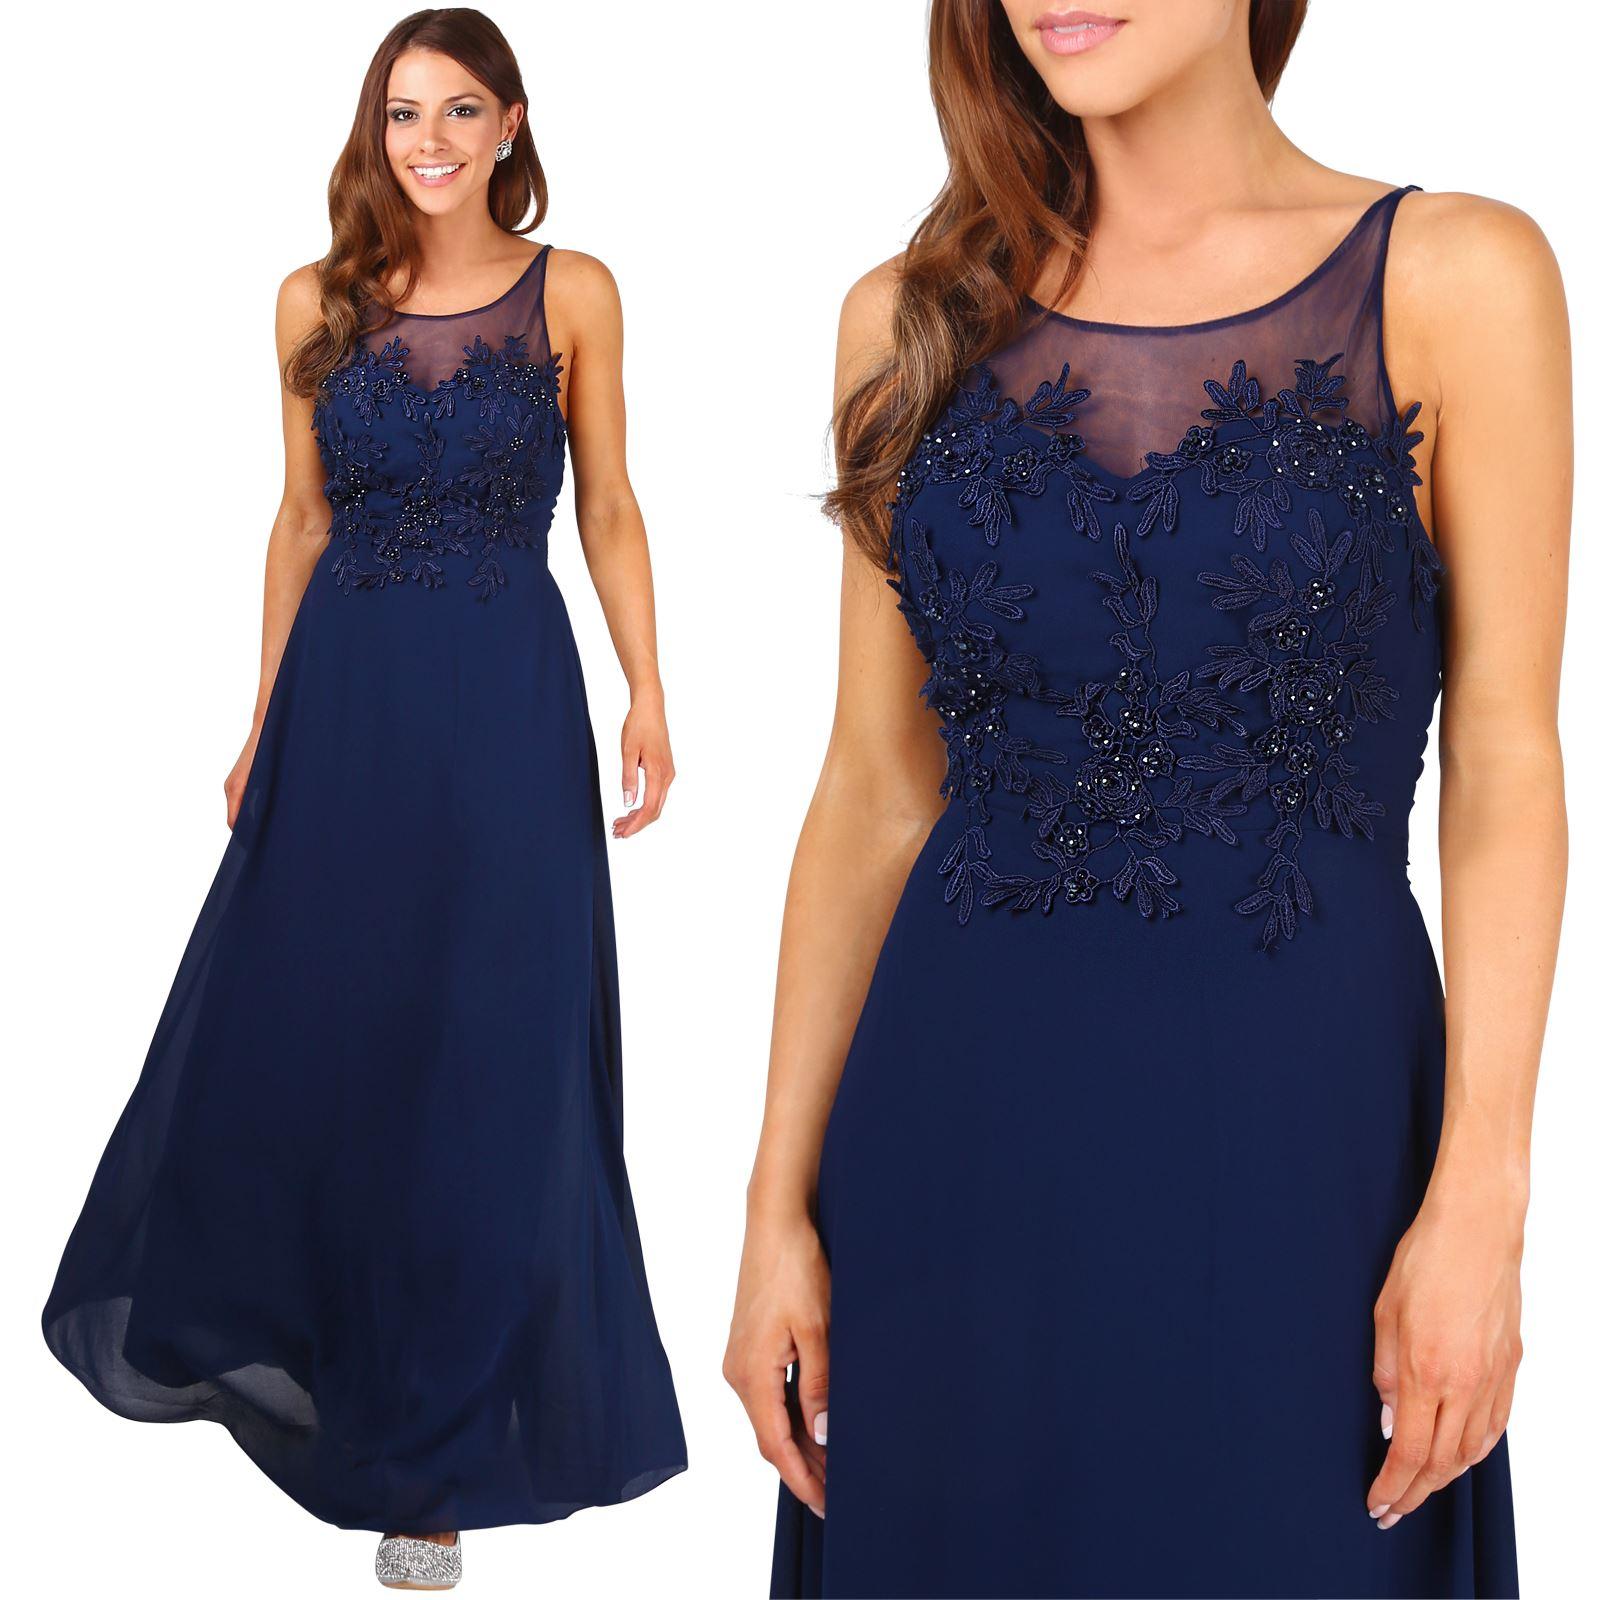 dd75bd384 Boda Verano Mujer Noche Gasa Largo 17 Vestido Ceremonia Azul Fiesta wXF1Hz